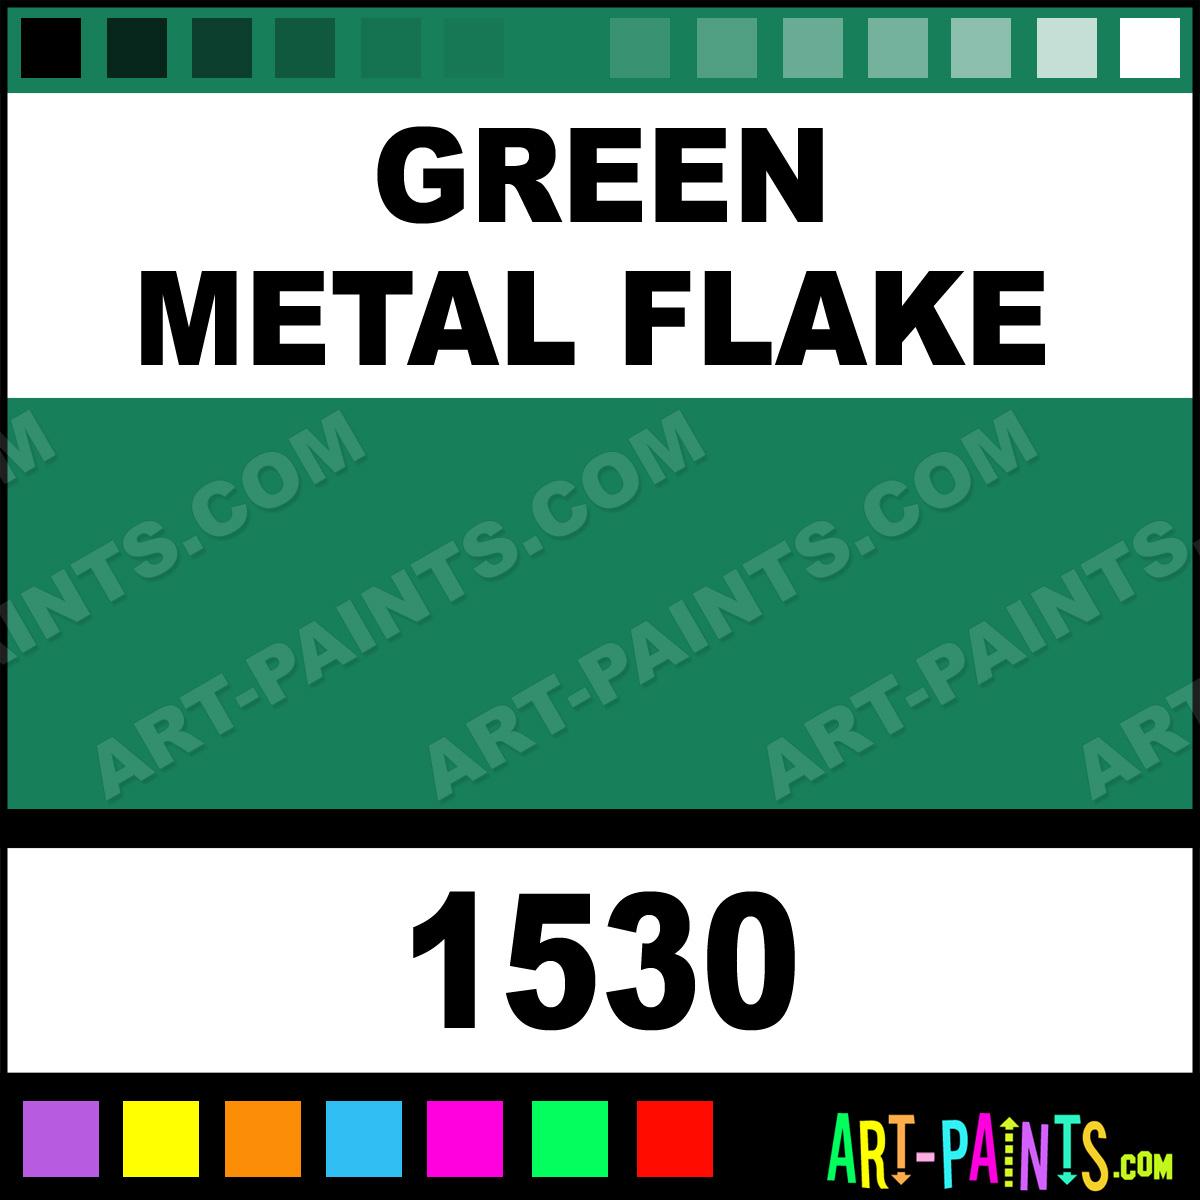 Green metal flake model metal paints and metallic paints 1530 green metal flake paint 1530 by testors model metal paints geenschuldenfo Choice Image